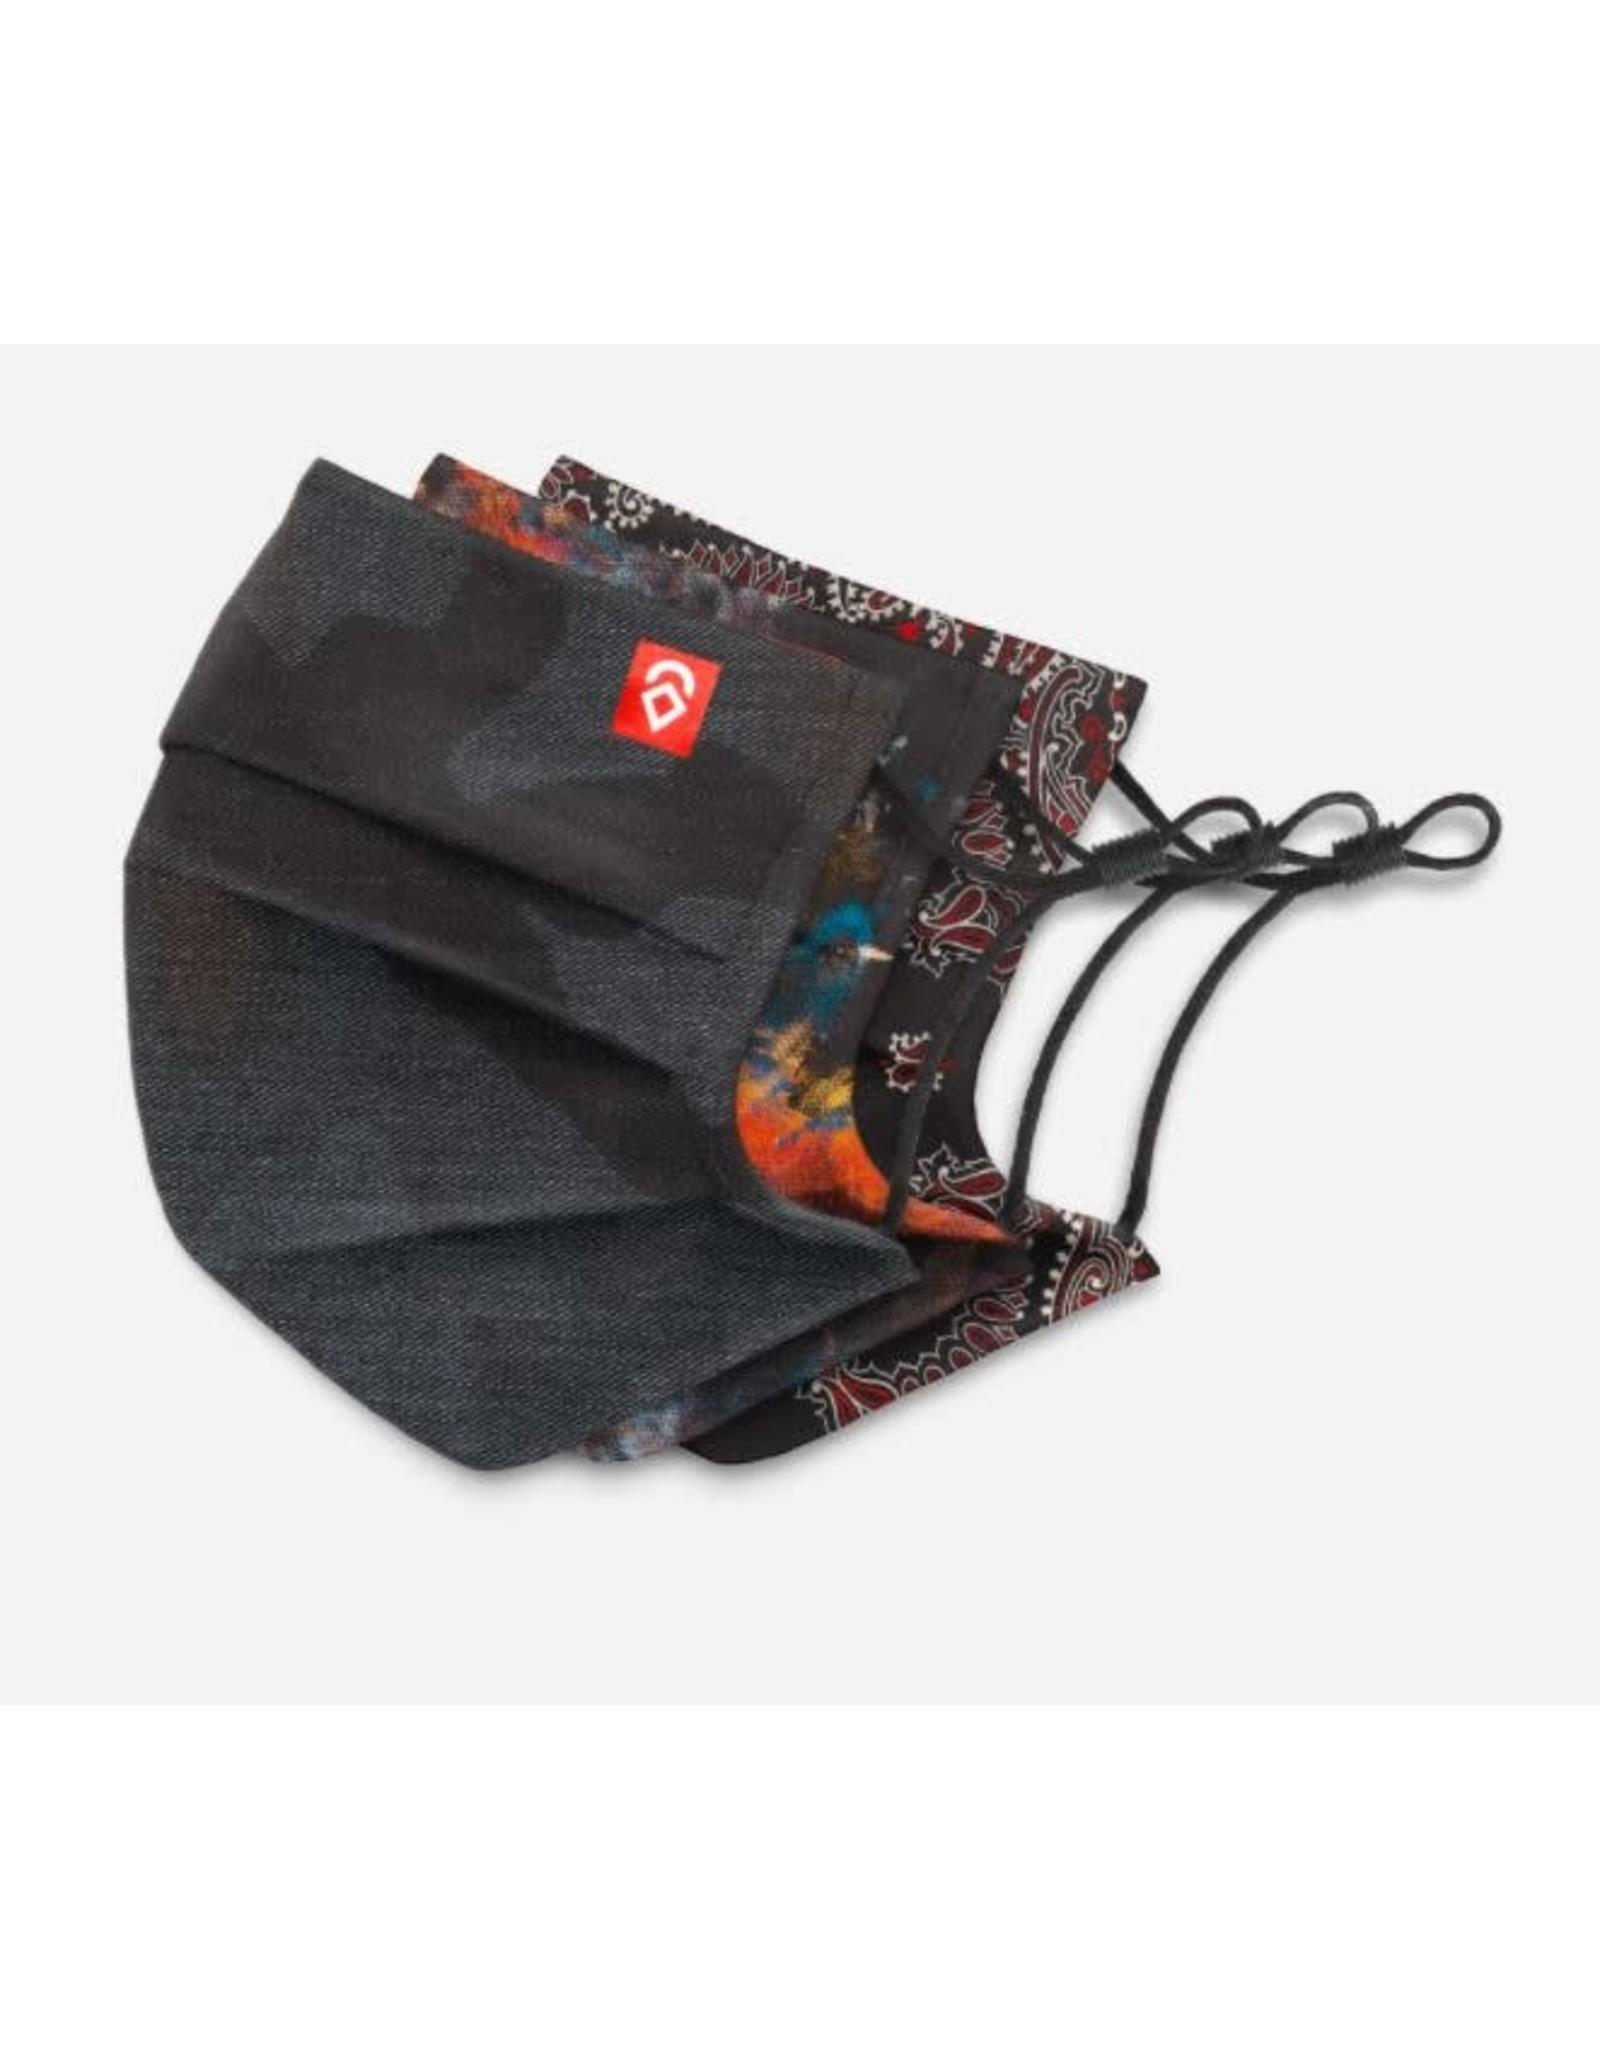 airhole Airhole - Masques basic shibuya stealth camo/studio/black paisley